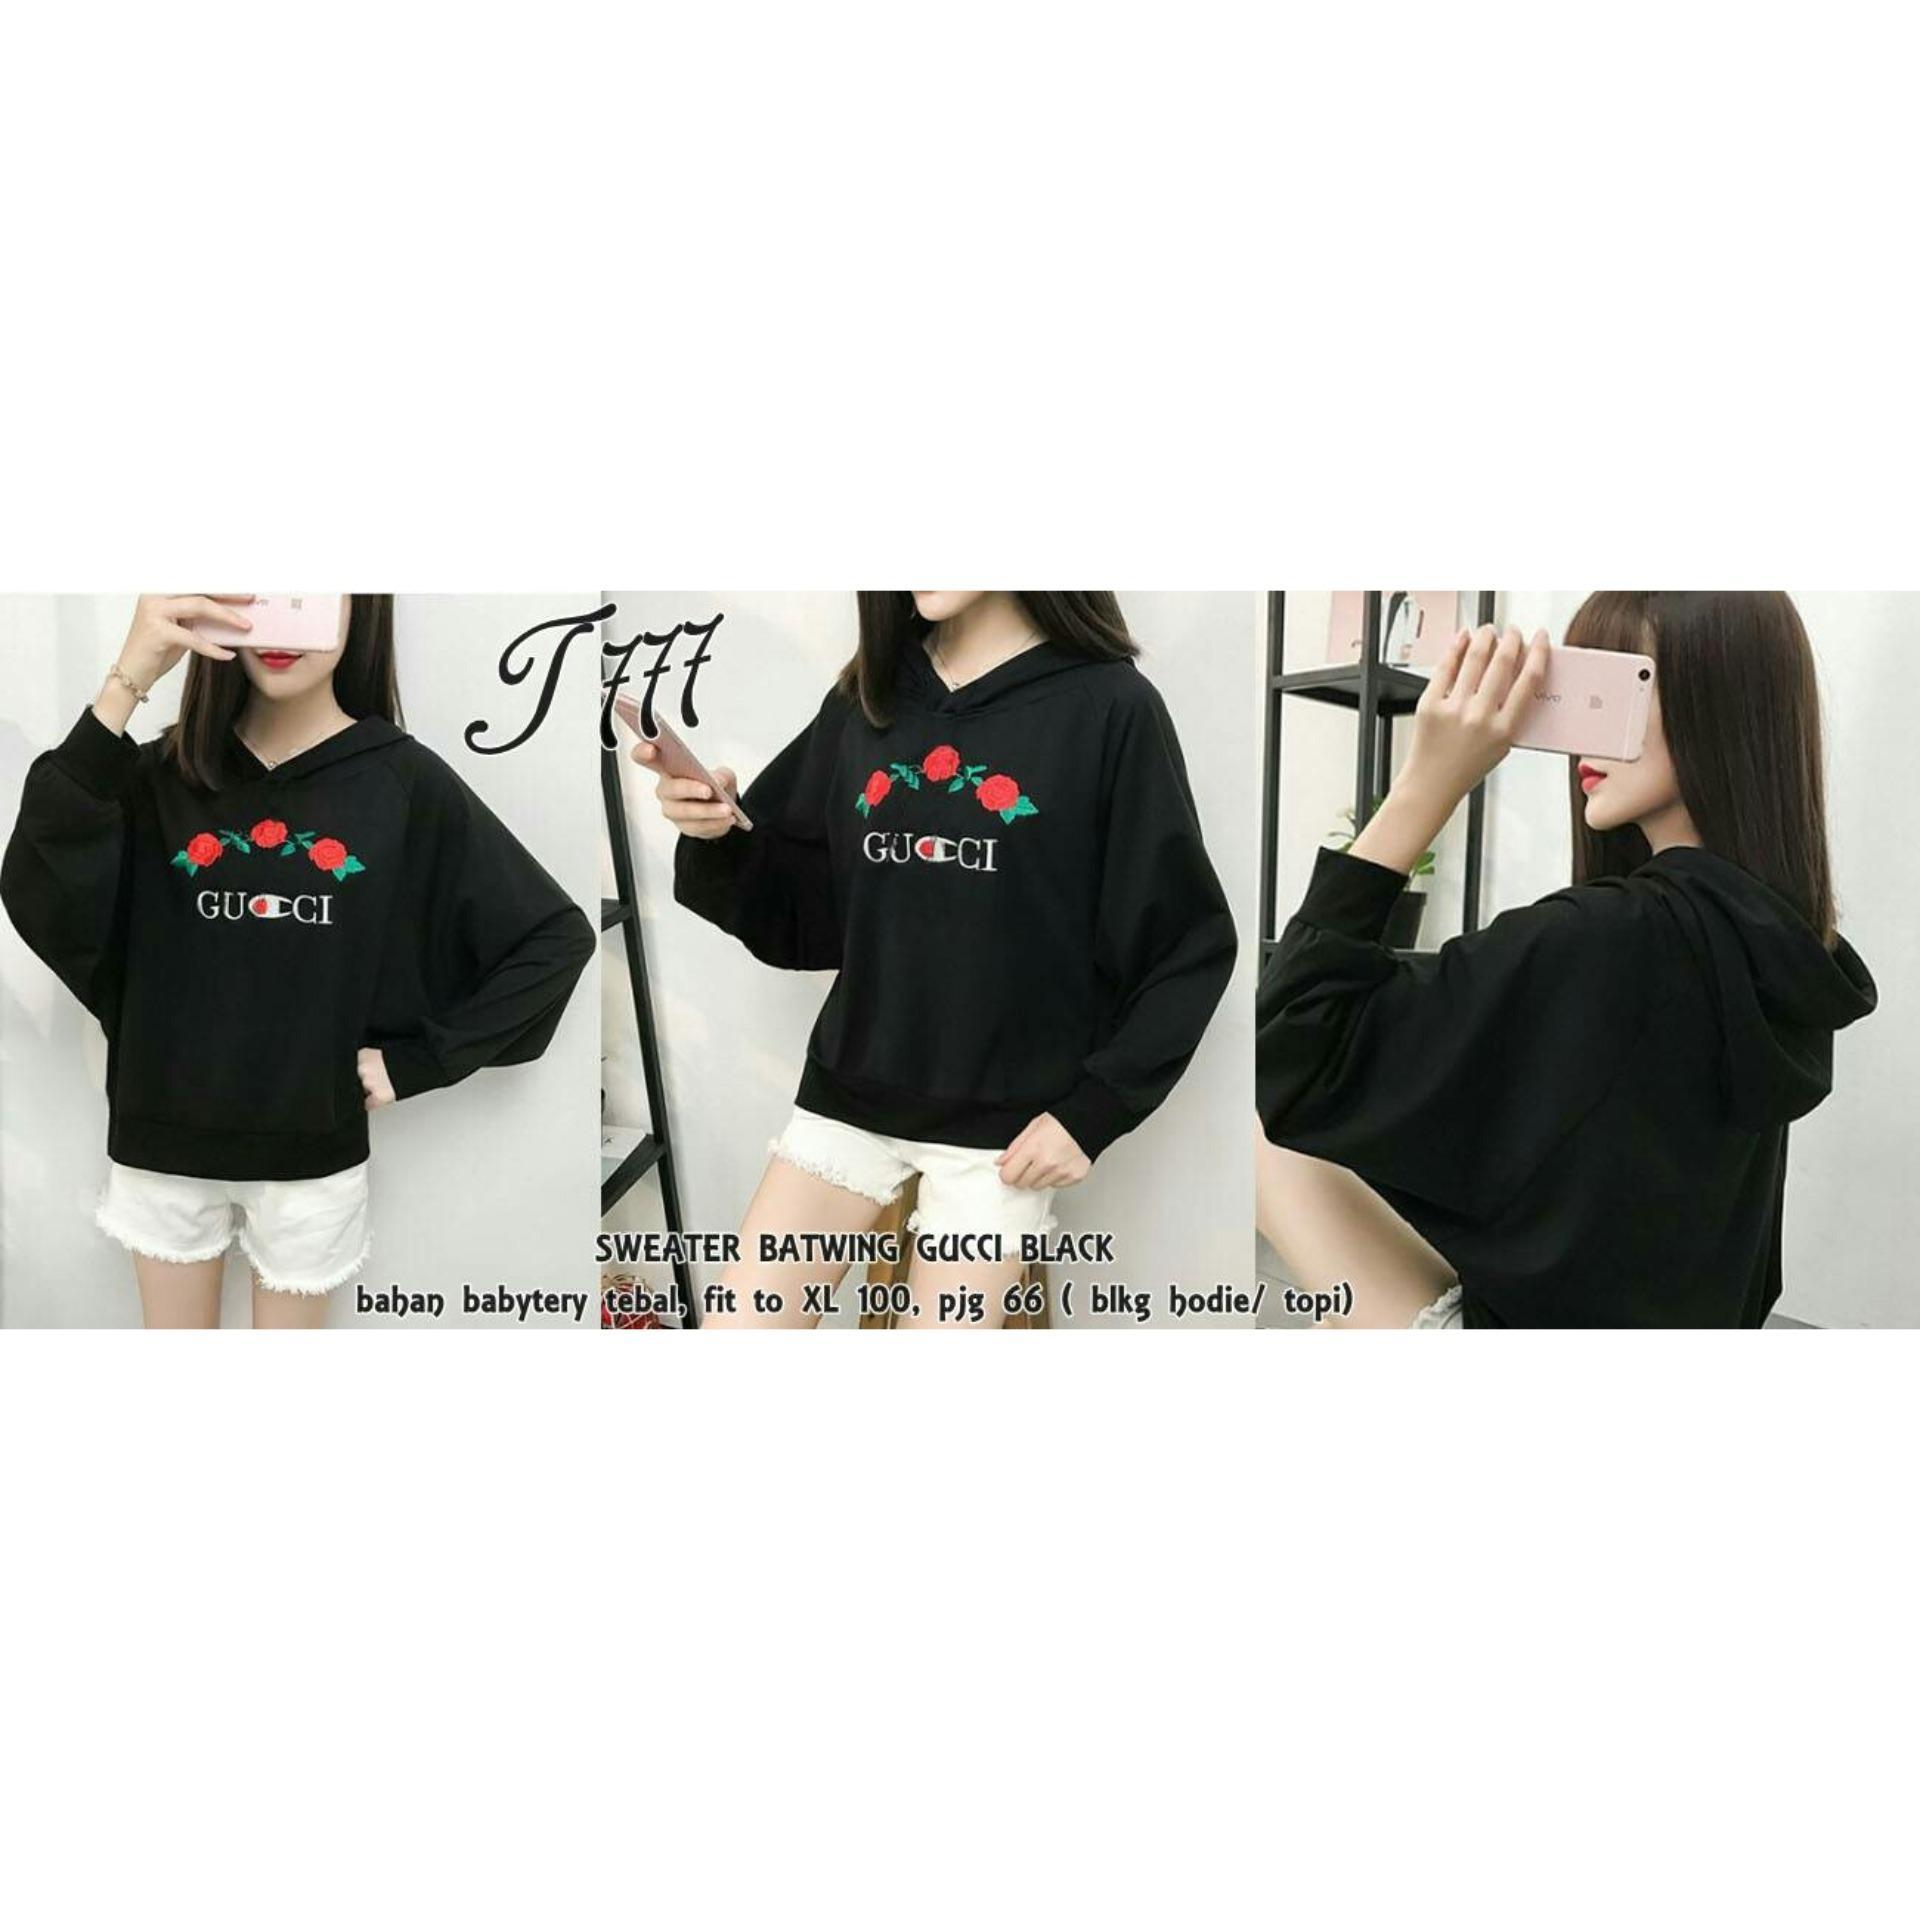 trendshopee Pakaian Hangat Wanita Sweater Batwing Gucci